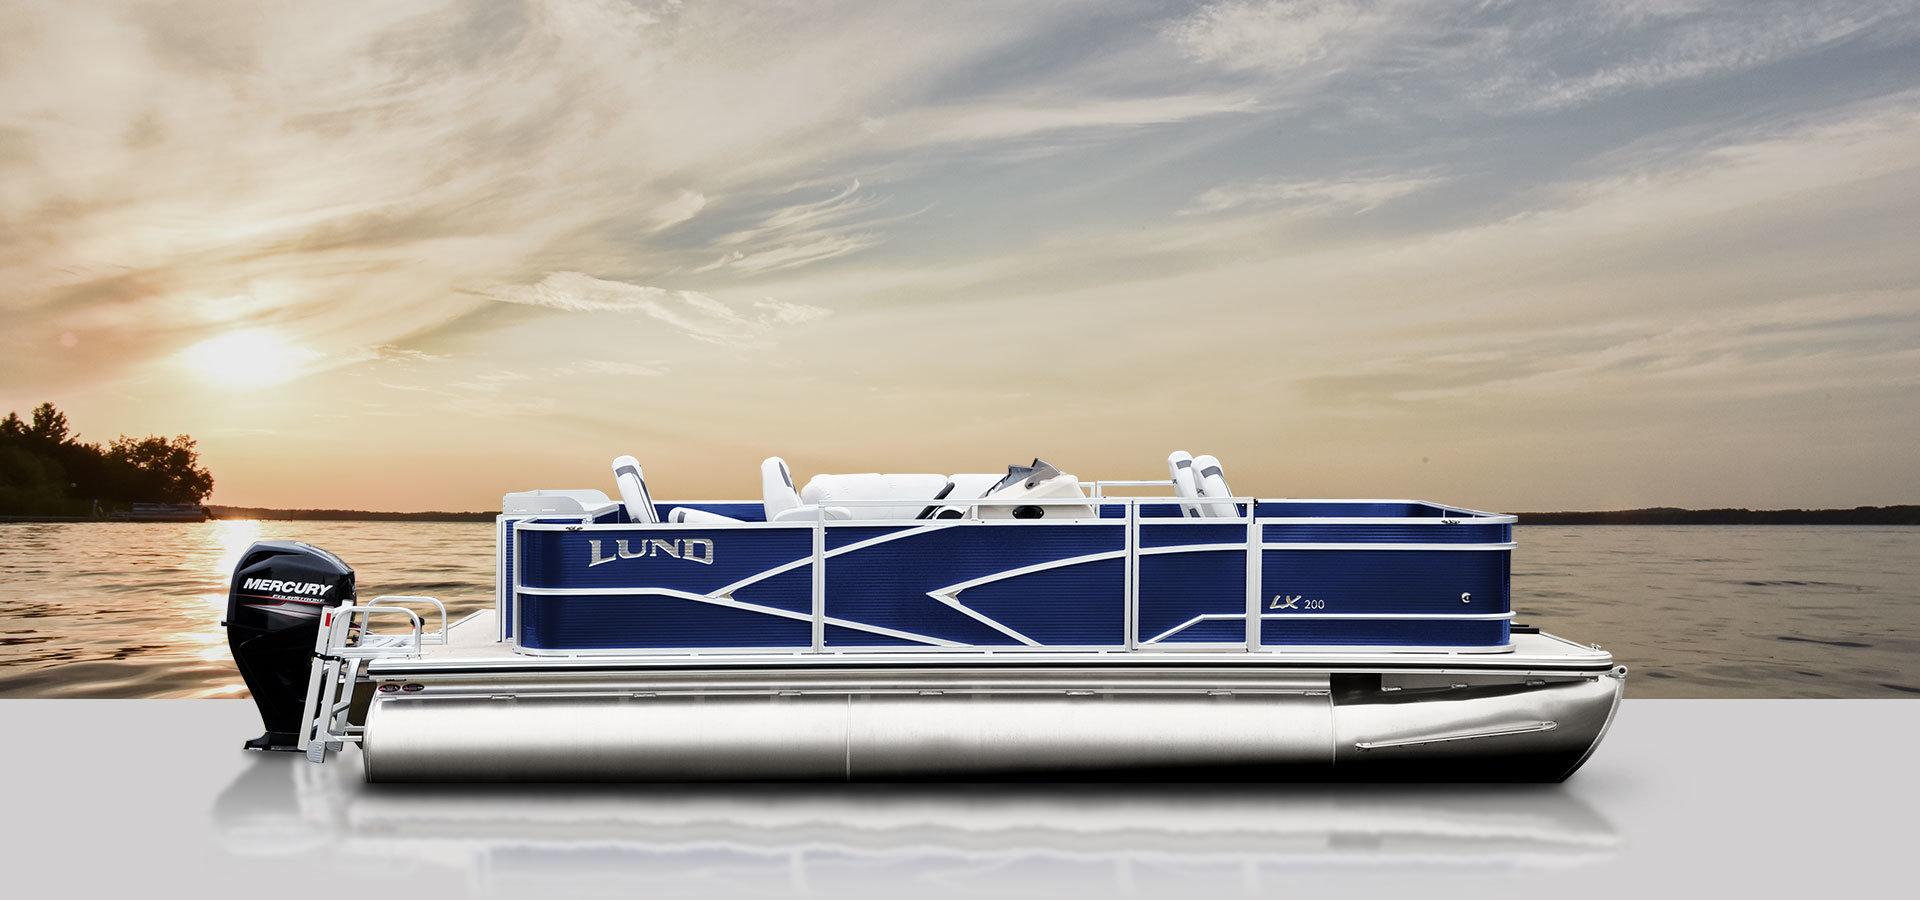 Lund LX200 Fishing Pontoon Boat 00068